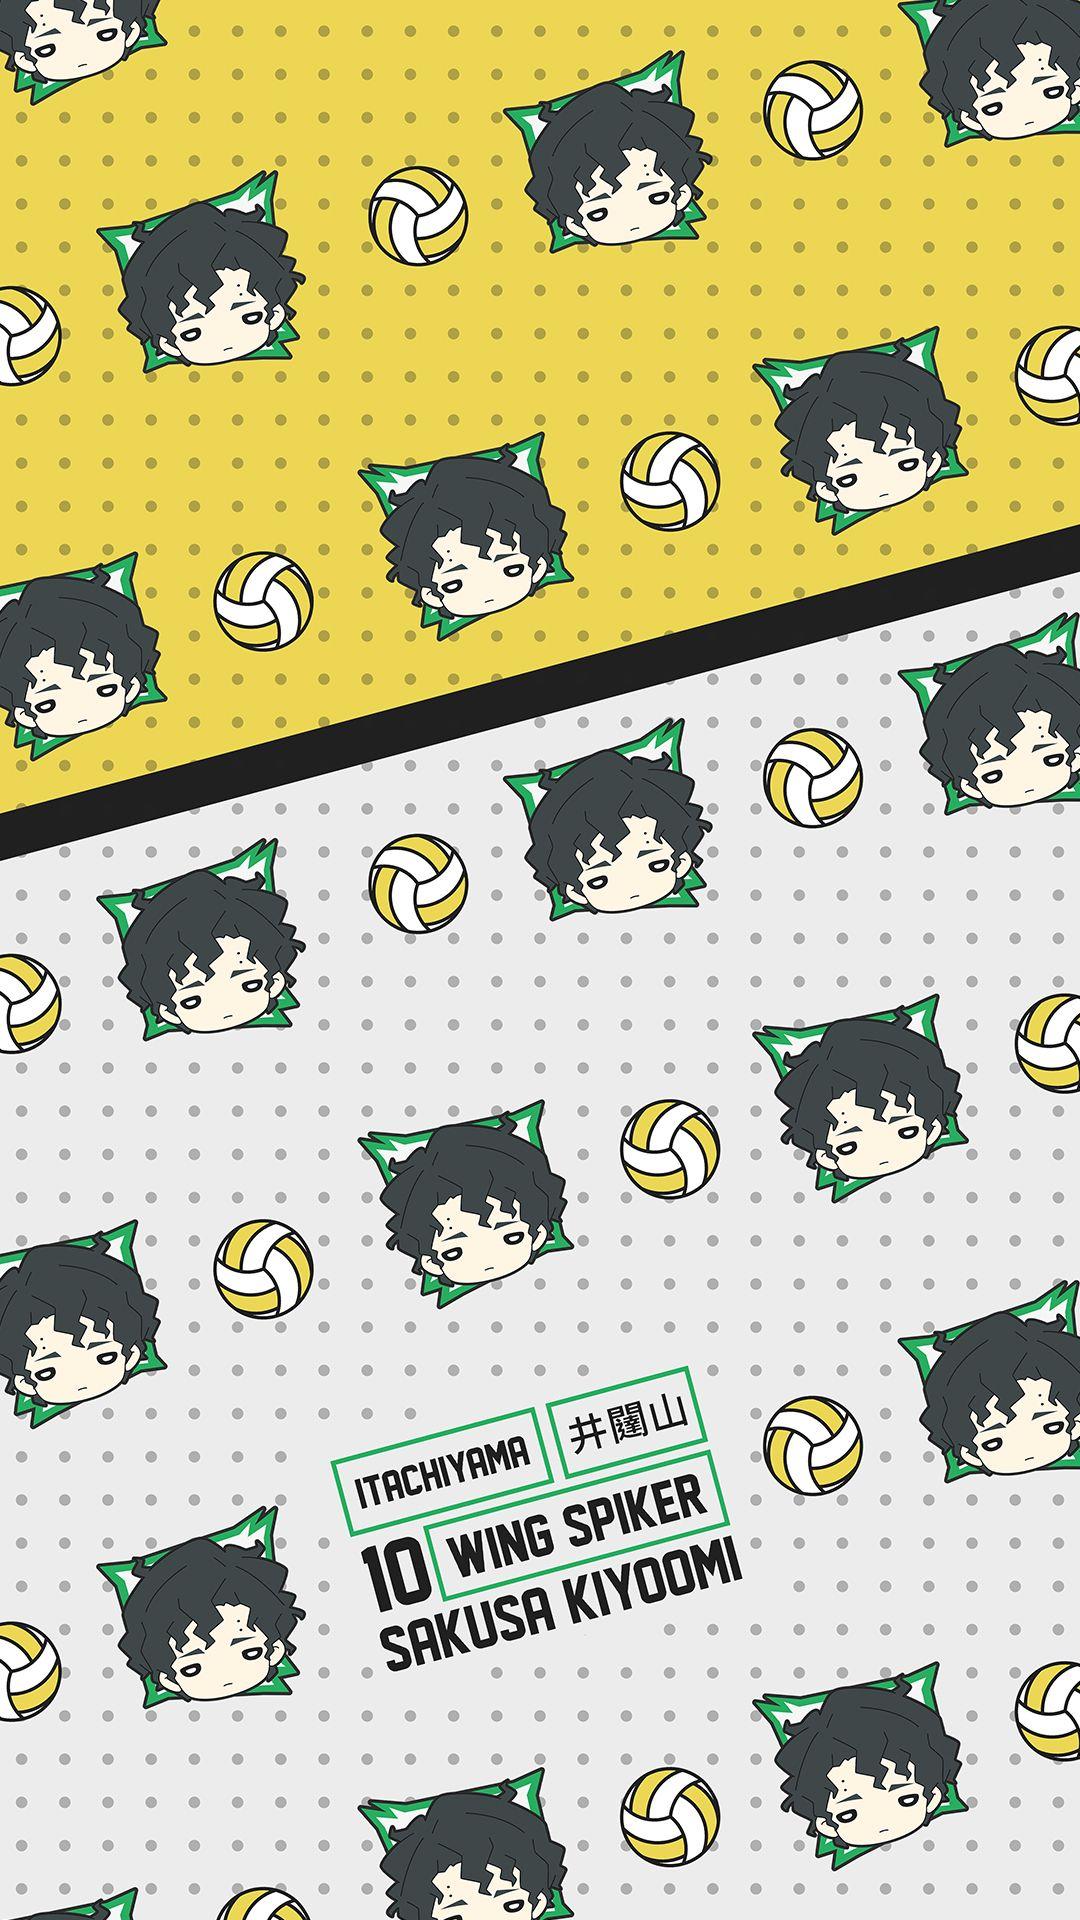 Sakusa Kiyoomi Pattern Wallpaper - Itachiyama - Click to Shop Haikyuu Merch With this Design